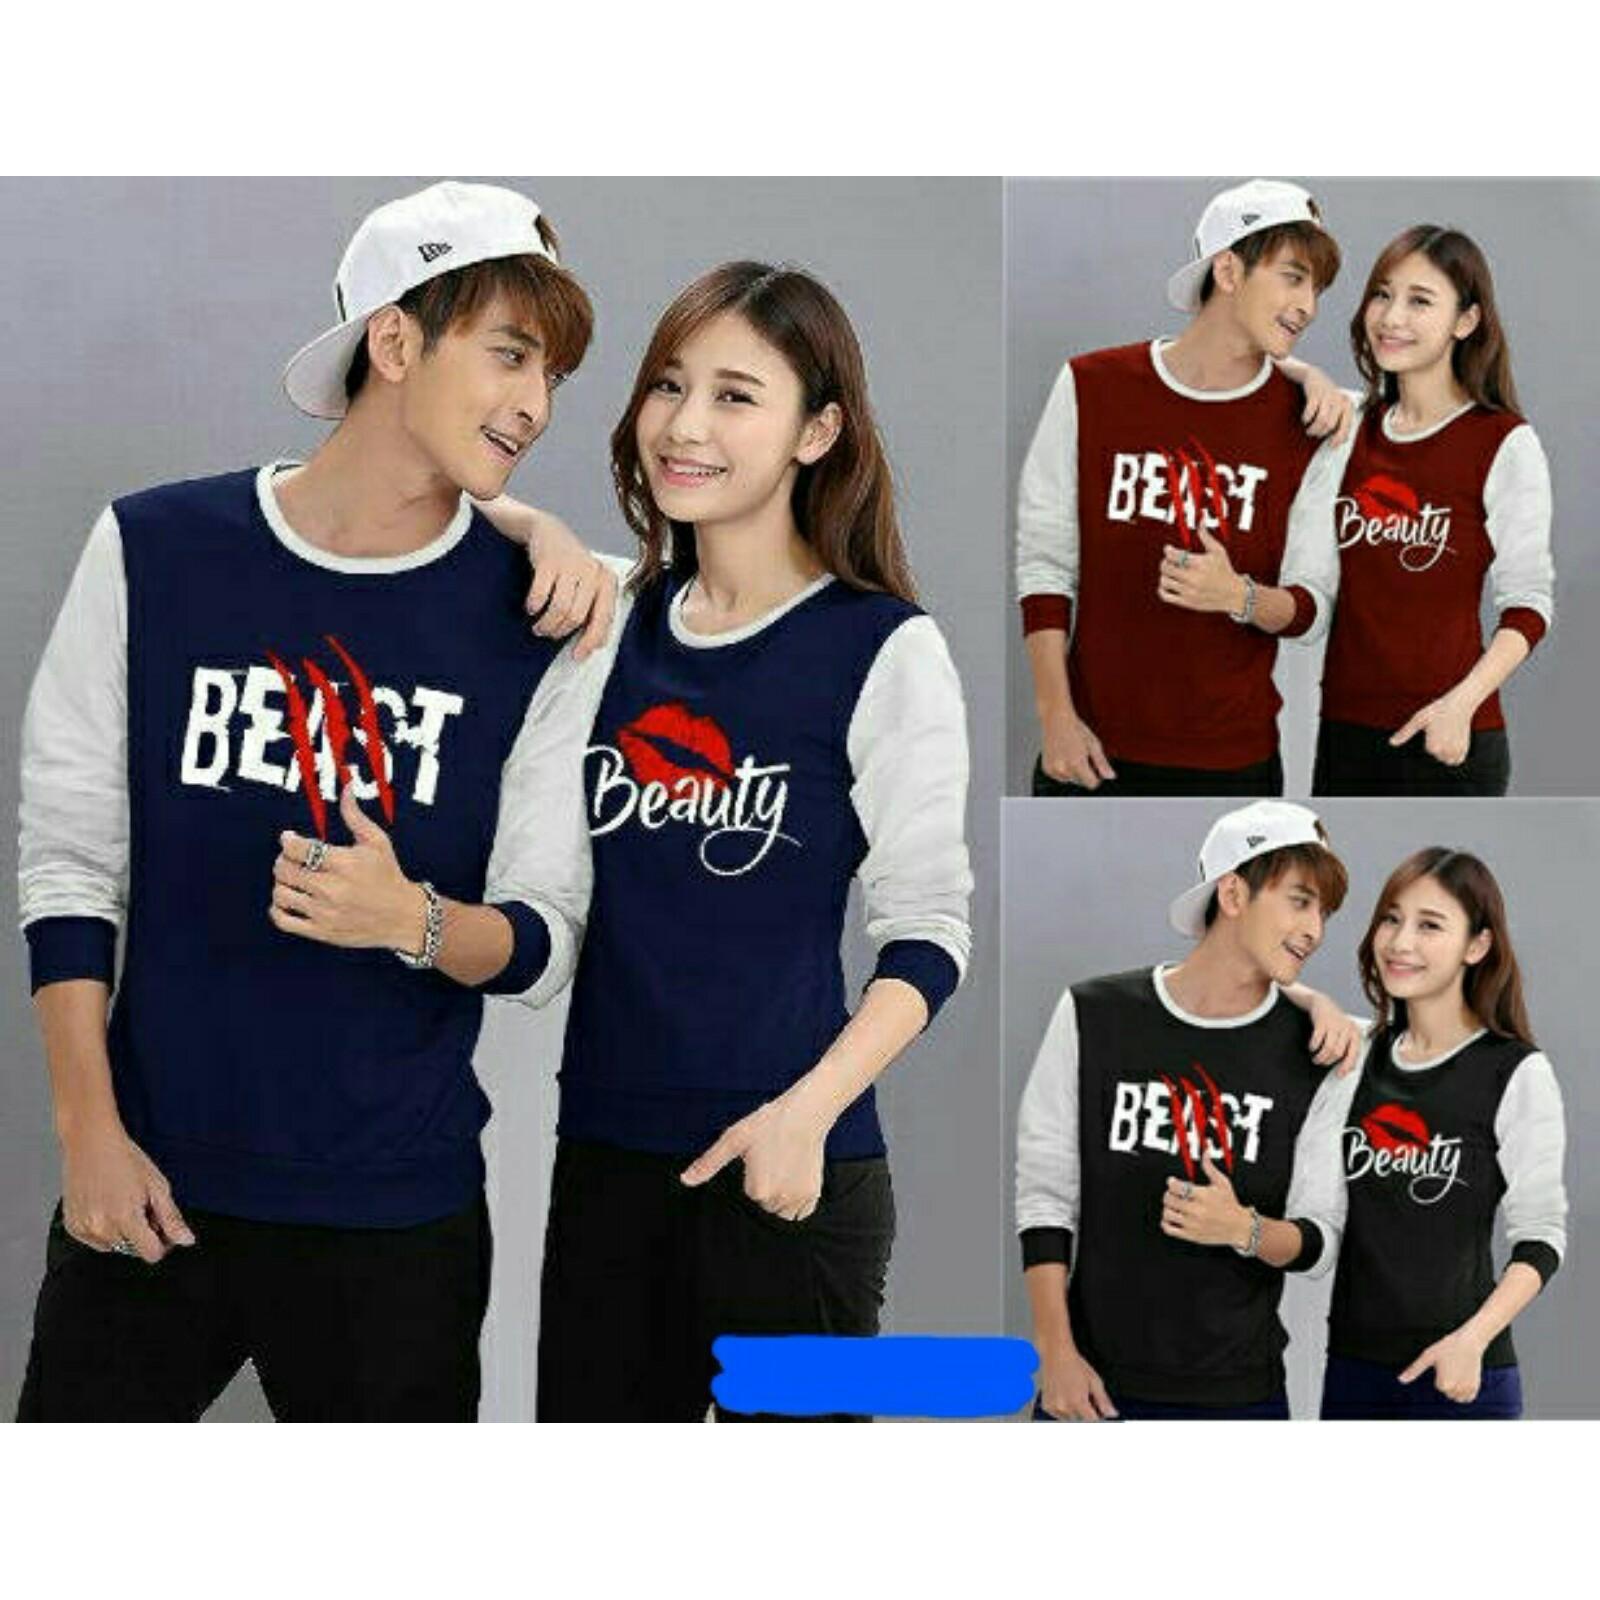 legiONshop-baju pasangan  sweater pasangan  sweater couple  atasan murah  pakaian couple terbaru  baju kembar  baju couple  sweater kembar BEAST N BEAUTY (pria dan wanita )